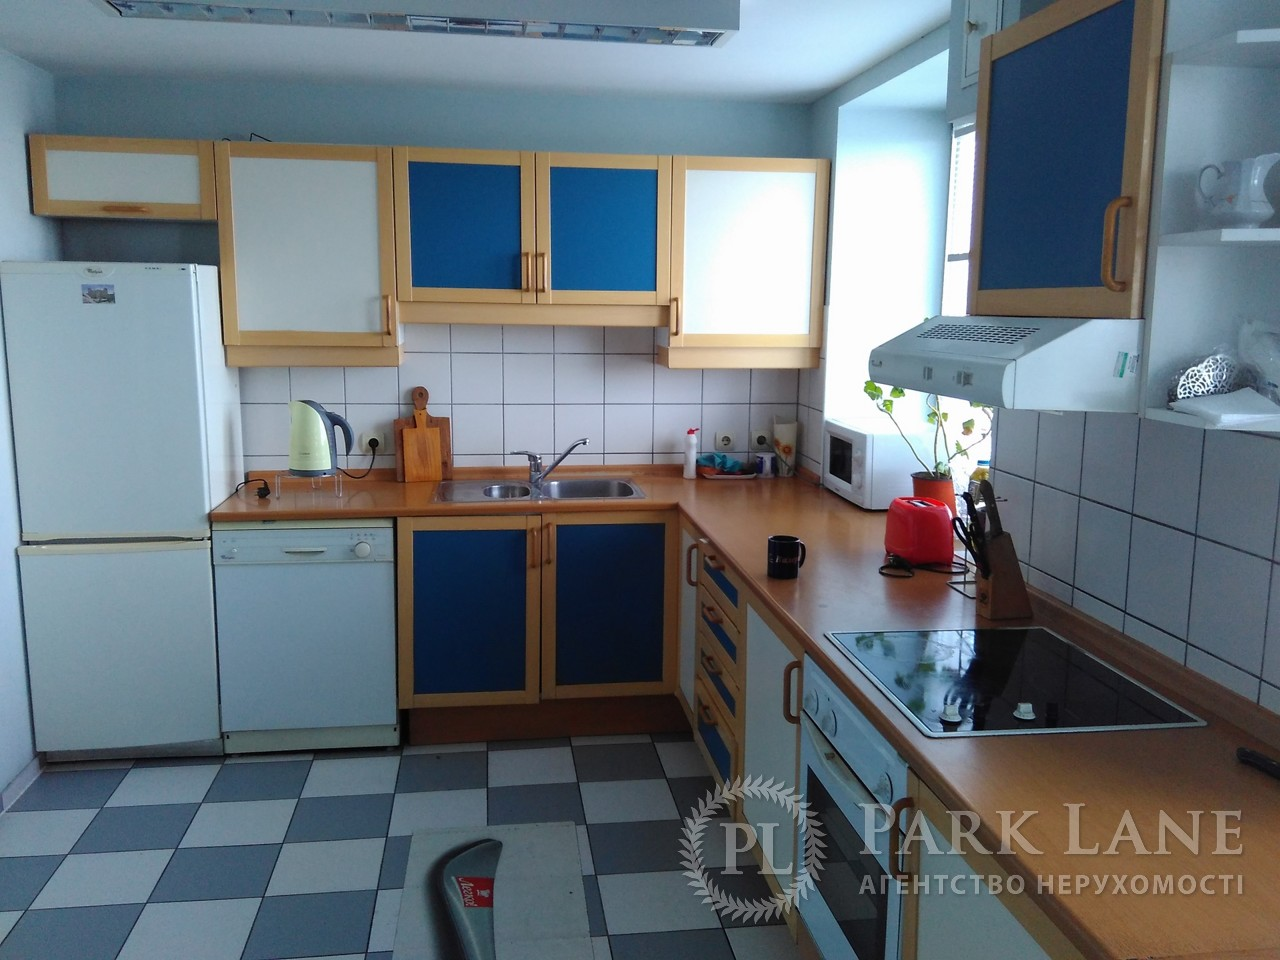 Офис, Z-1258663, Новаторов, Киев - Фото 6